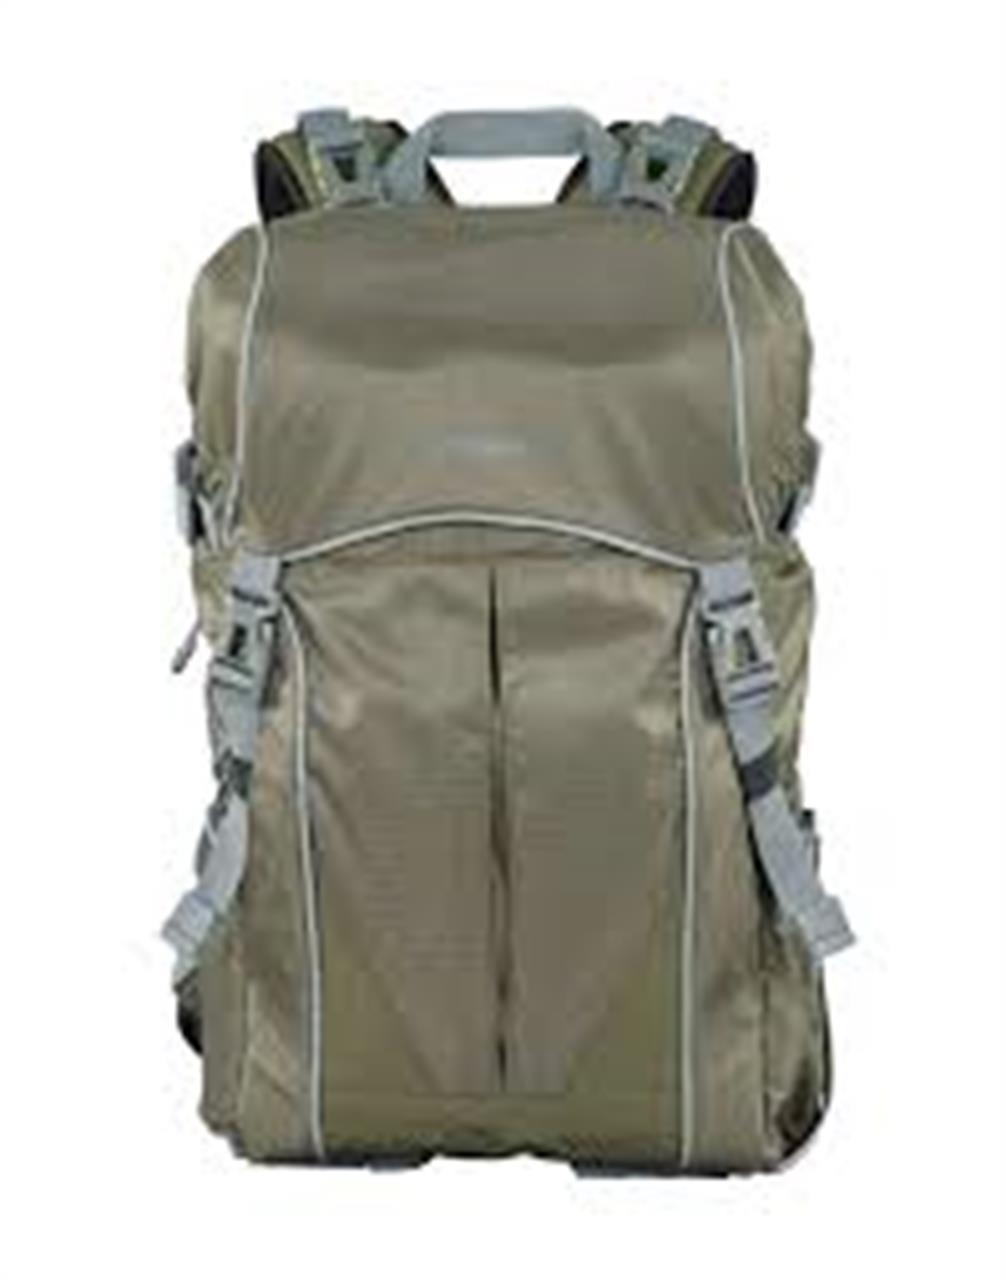 4007134020870__cullmann-ultralight-2in1-daypack-600_-olijf.jpg